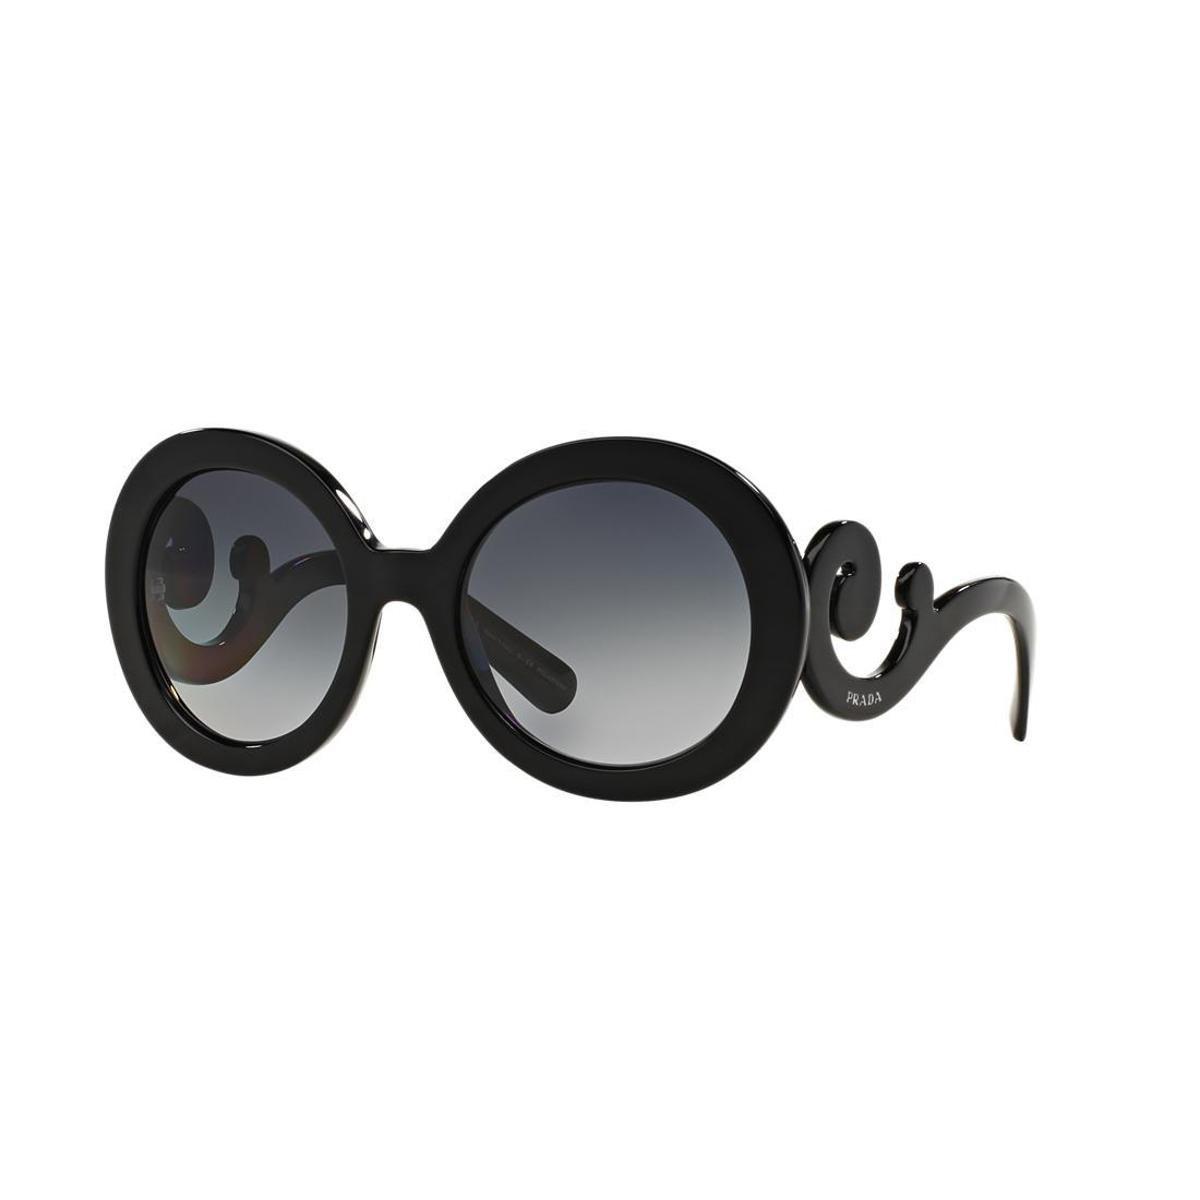 2cd738da41295 Óculos de Sol Prada PR 27NS Minimal Baroque - Compre Agora